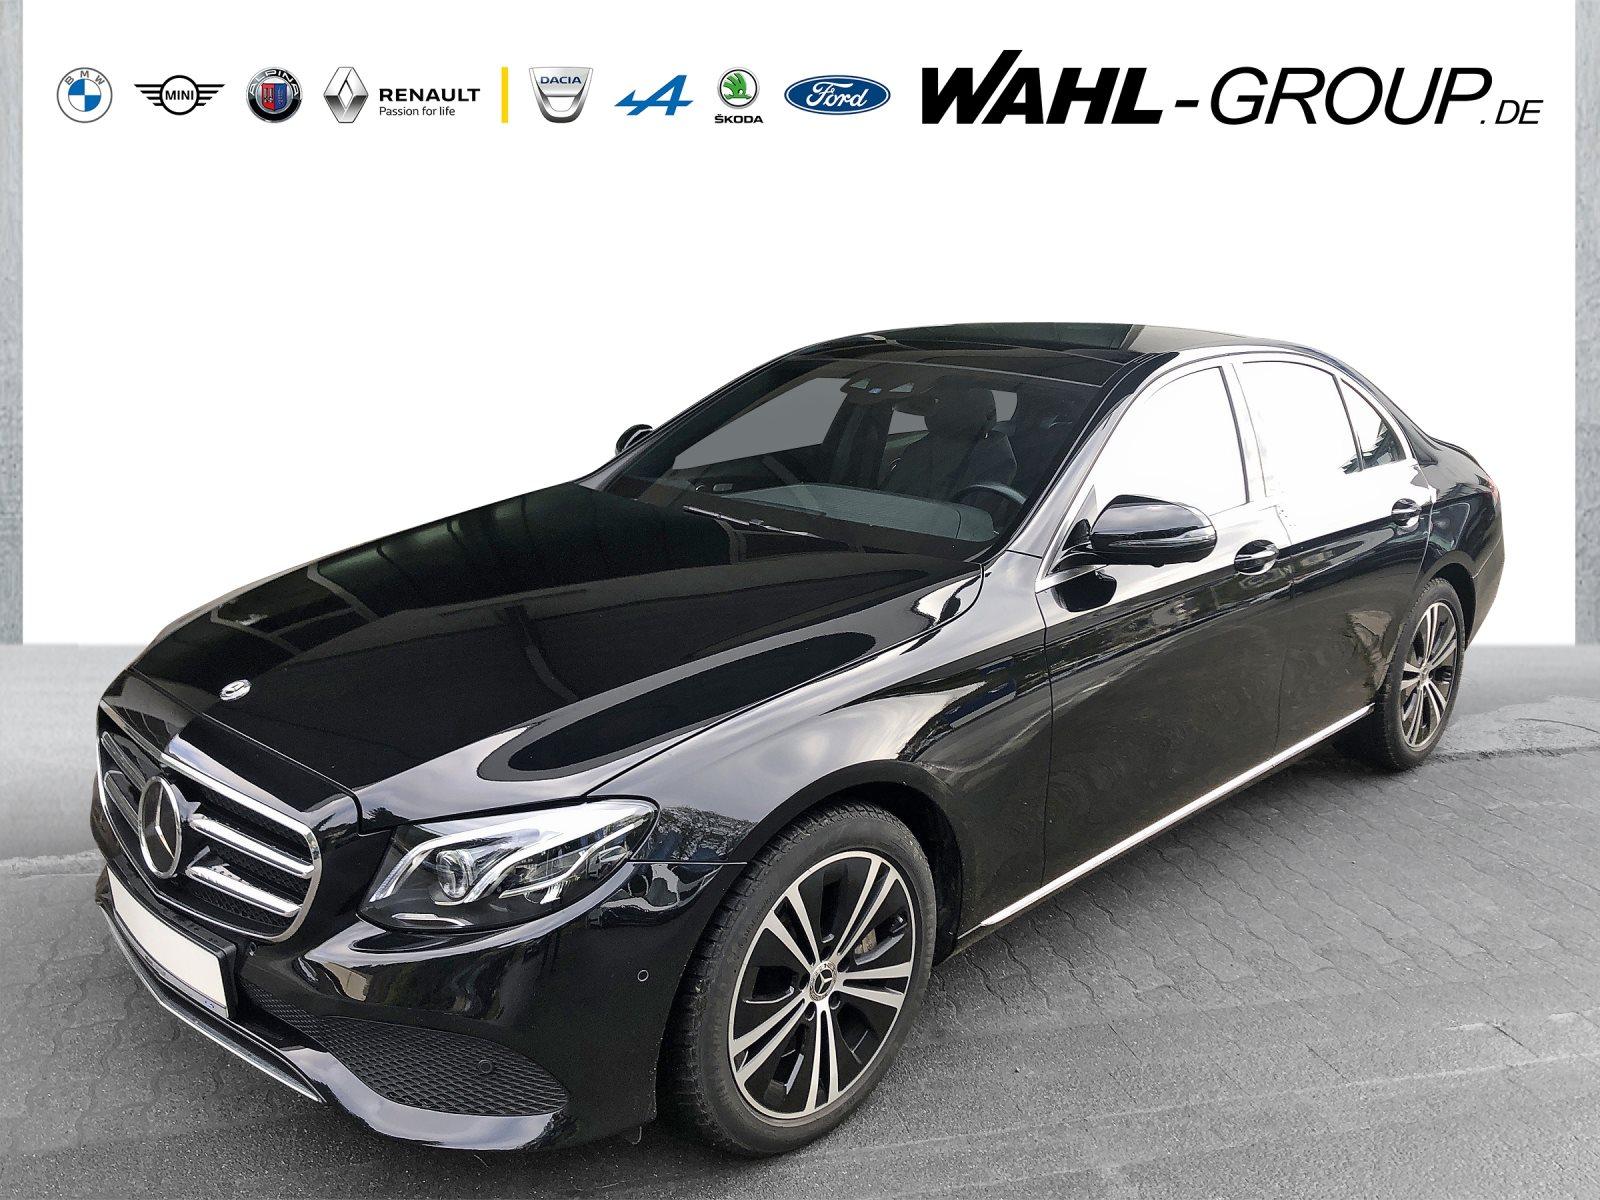 Mercedes-Benz E 450 AVANTGARDE+4MATIC+DAB+DYNAMIC SELECT, Jahr 2019, Benzin